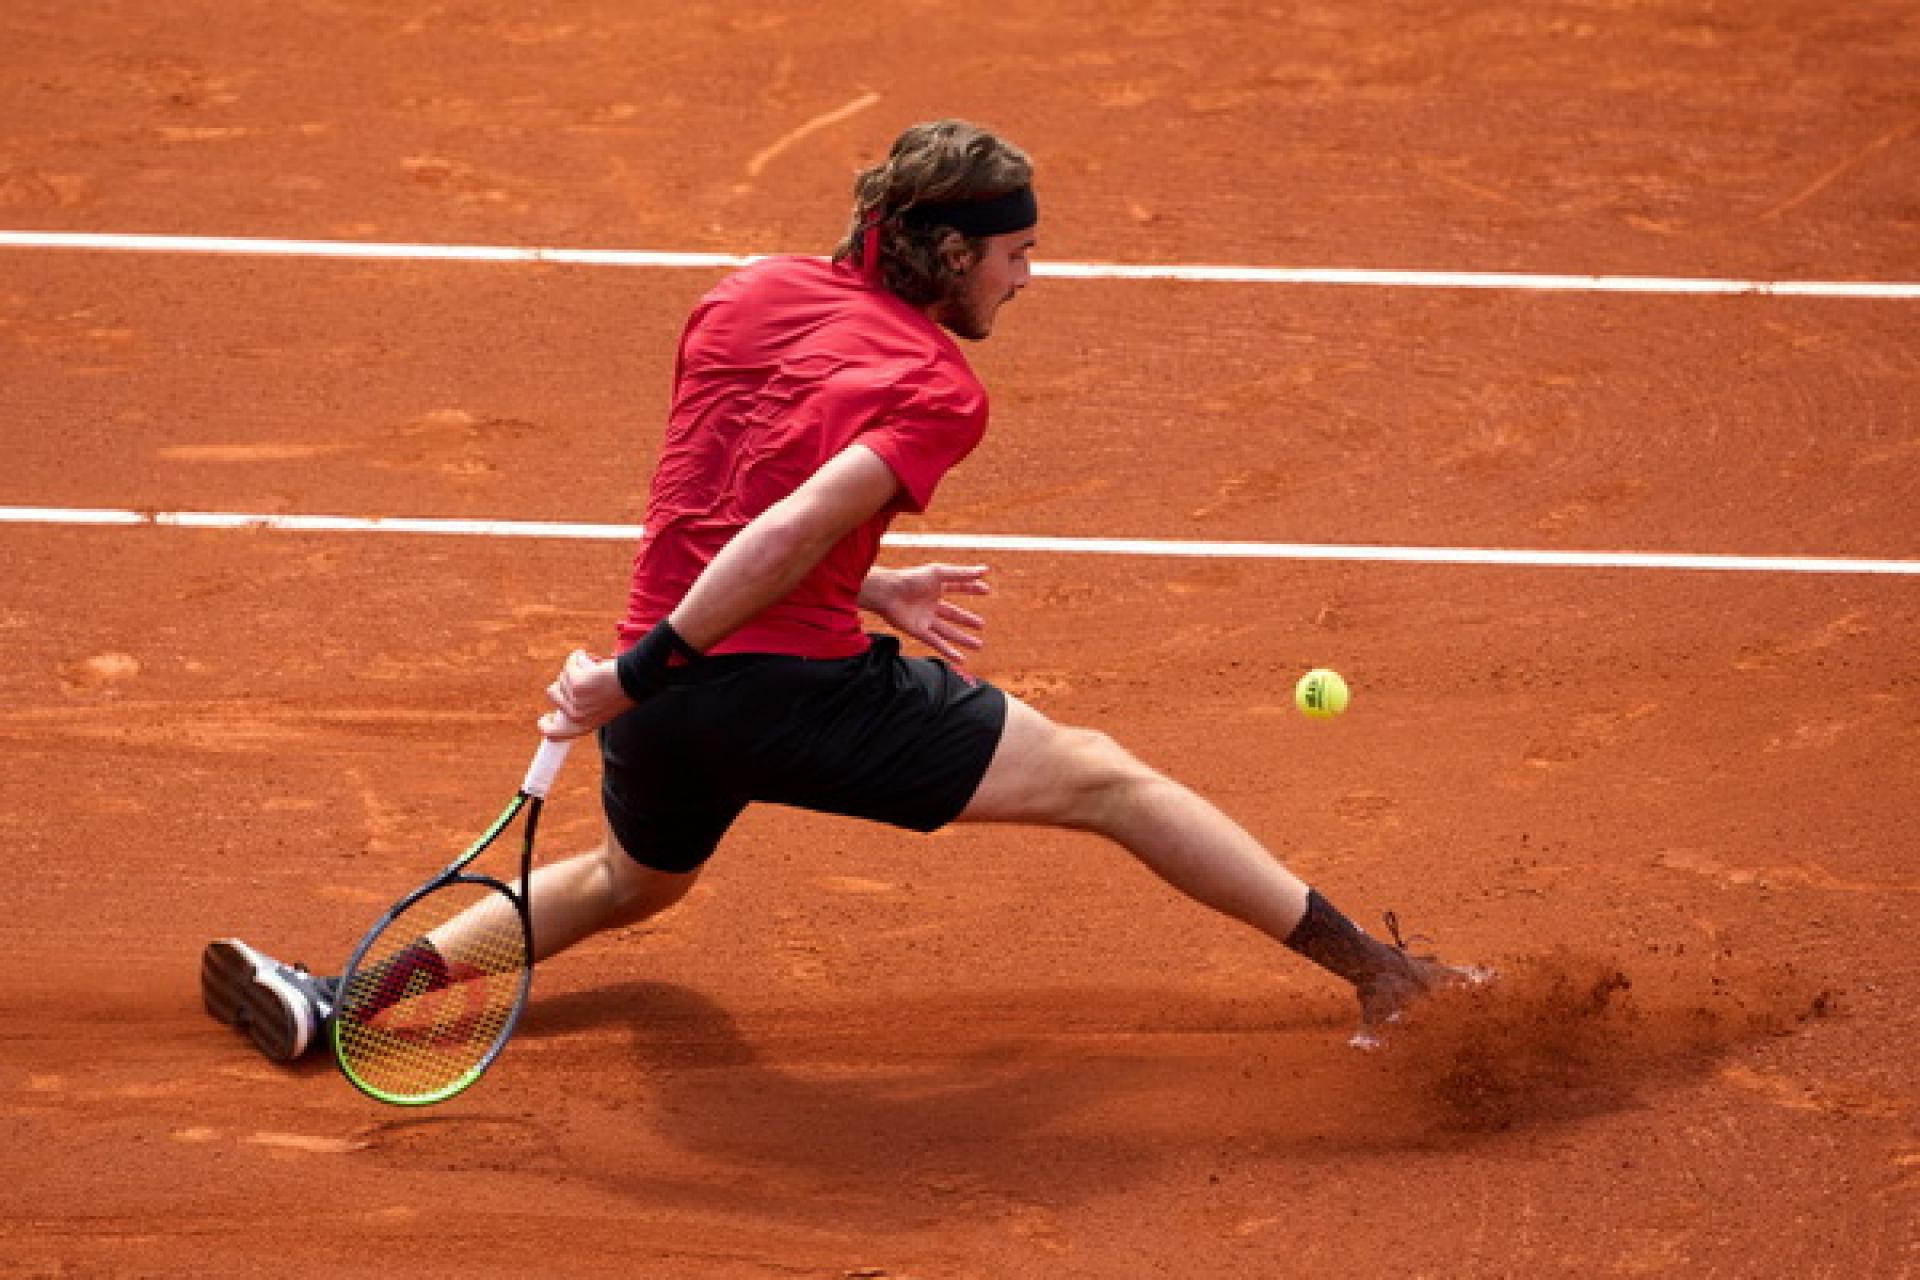 Rome Open 2021: Stefanos Tsitsipas vs. Marin Cilic Tennis Pick and Prediction